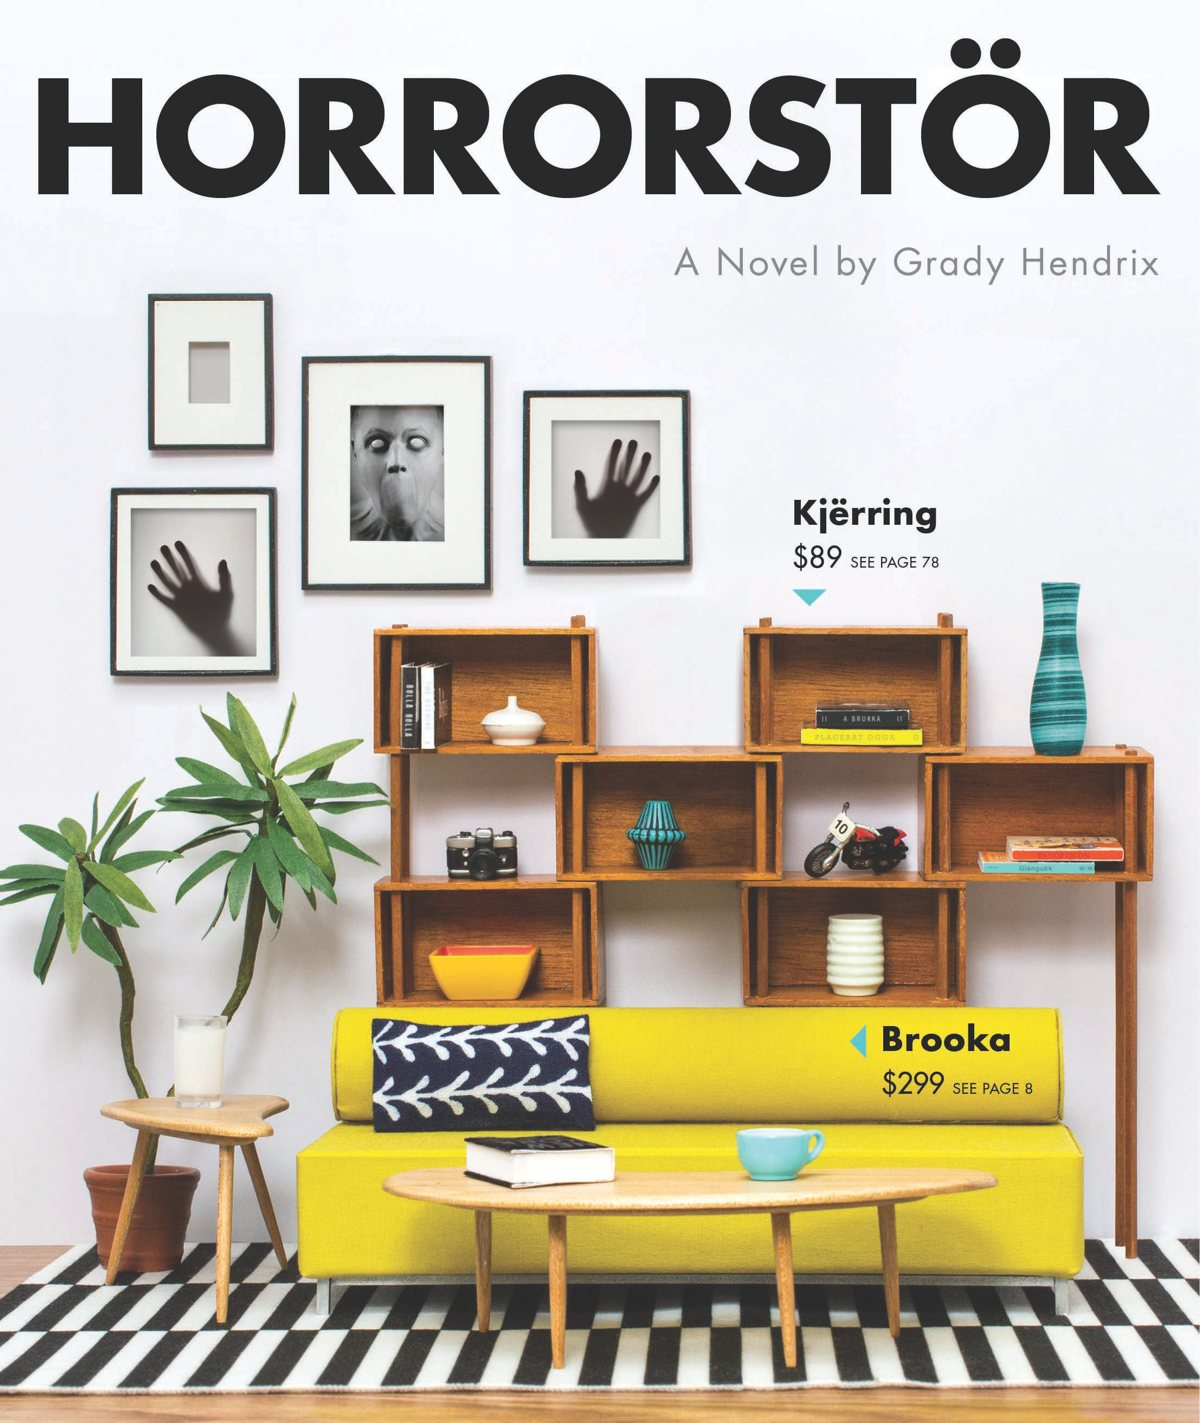 Oh My Experience Ikea Catalove 2014: A Horror Novel That Looks Like An IKEA Catalog